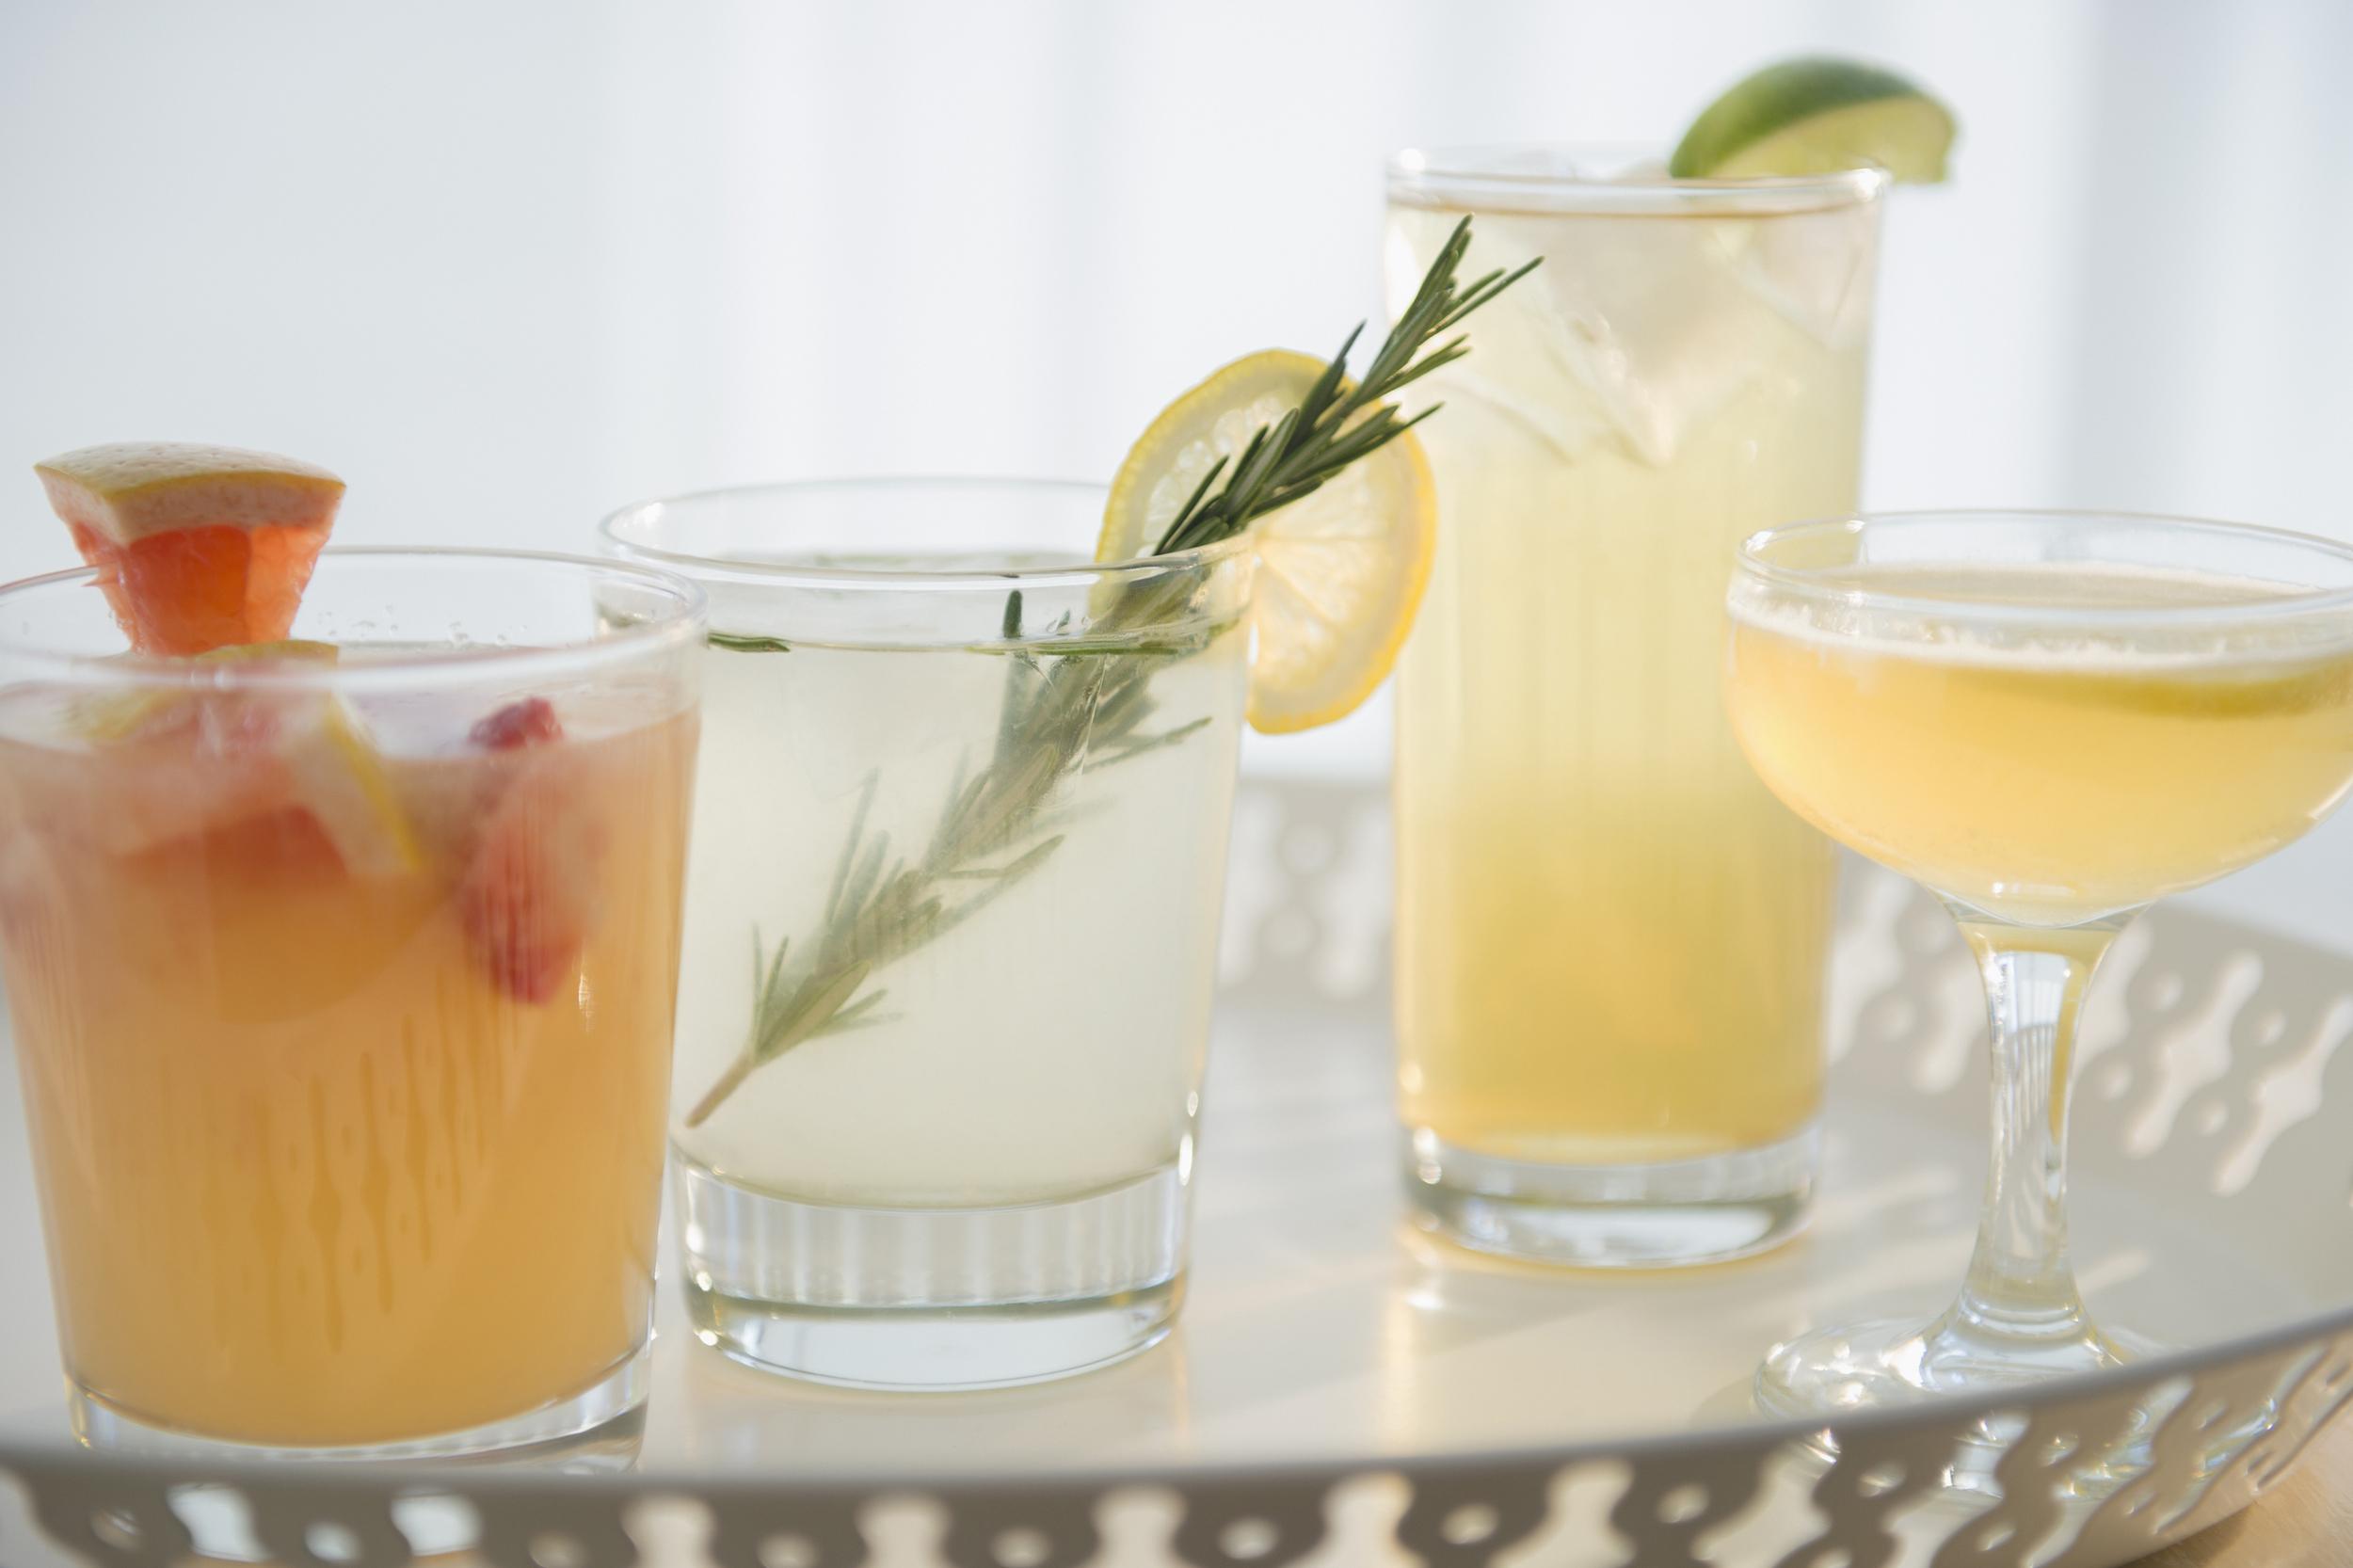 15 cocktail recipes - chasing saturdays